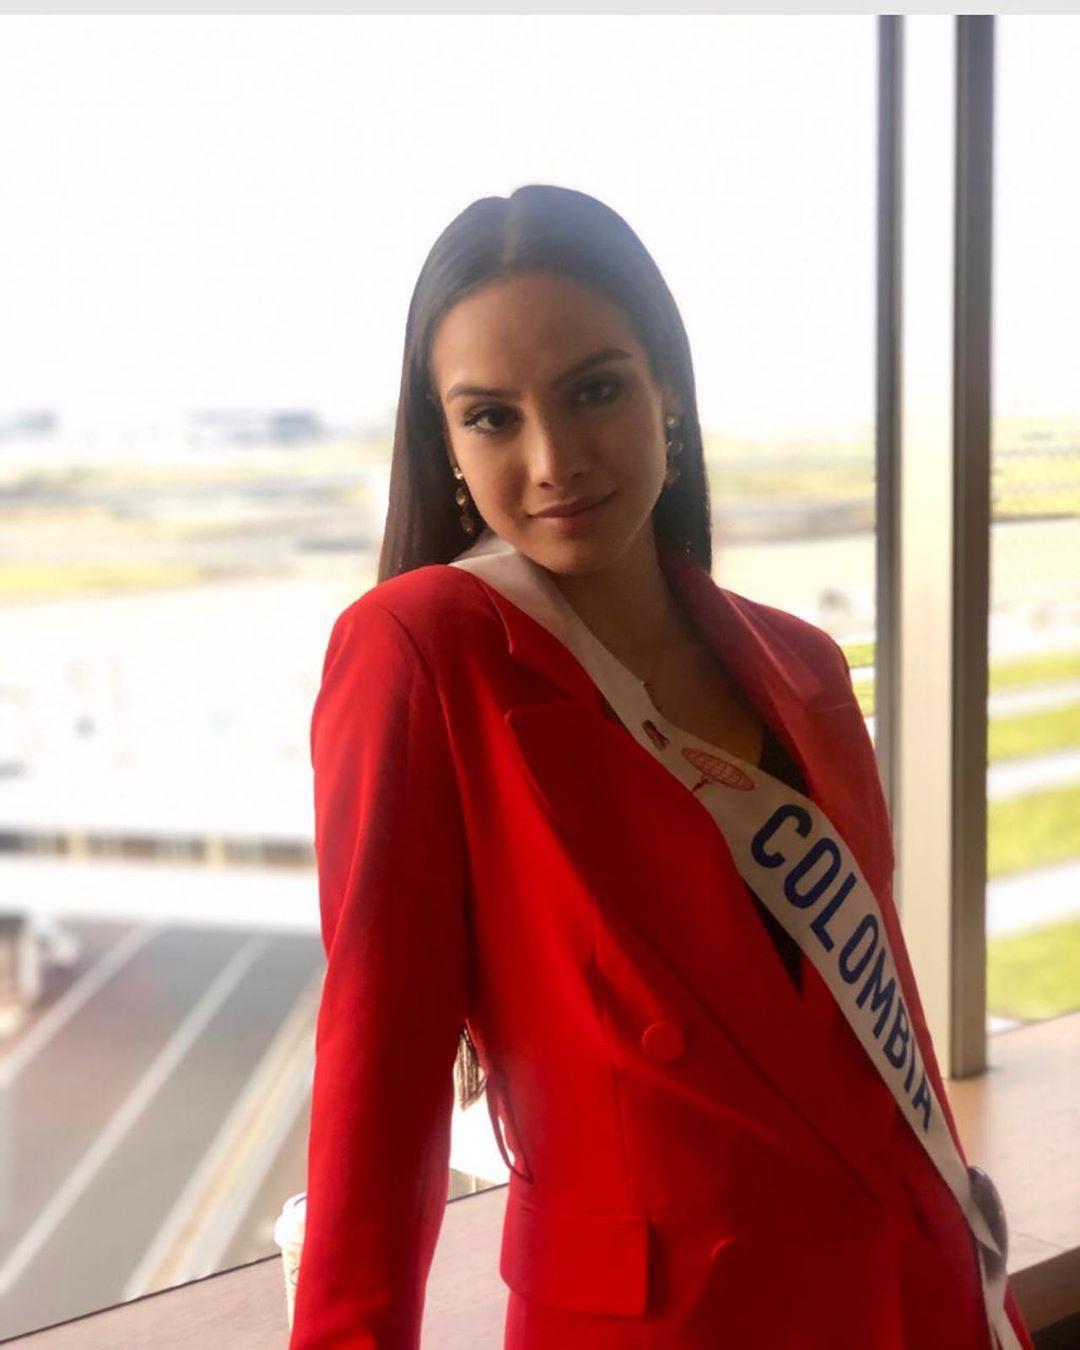 maria alejandra vengoechea, miss colombia hispanoamericana 2021/3rd runner-up de miss international 2019. - Página 5 75388510